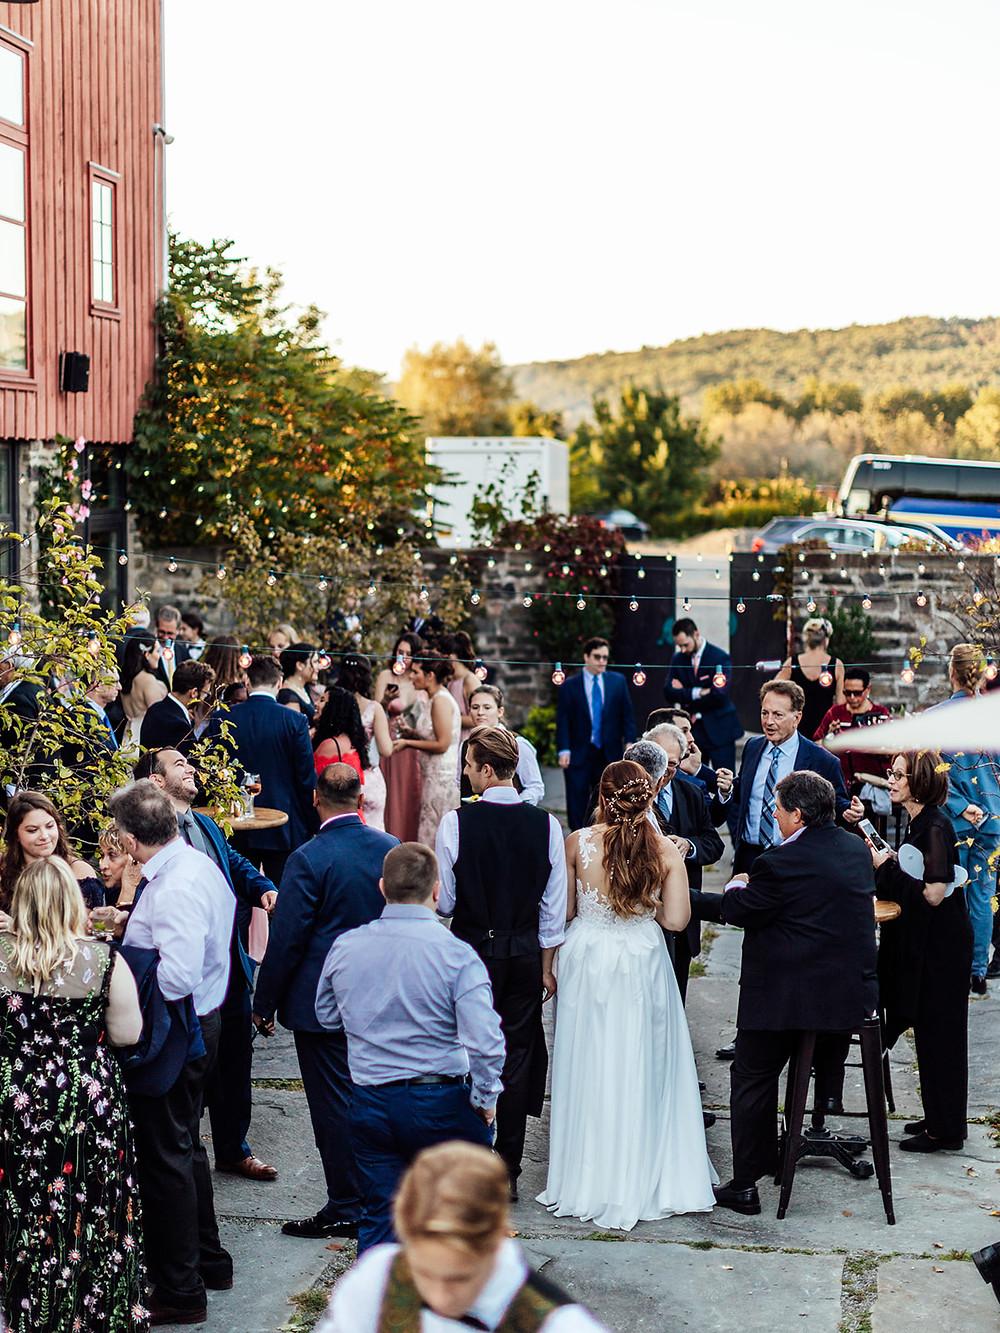 Vintage Glam Barn Wedding at The Treman Center